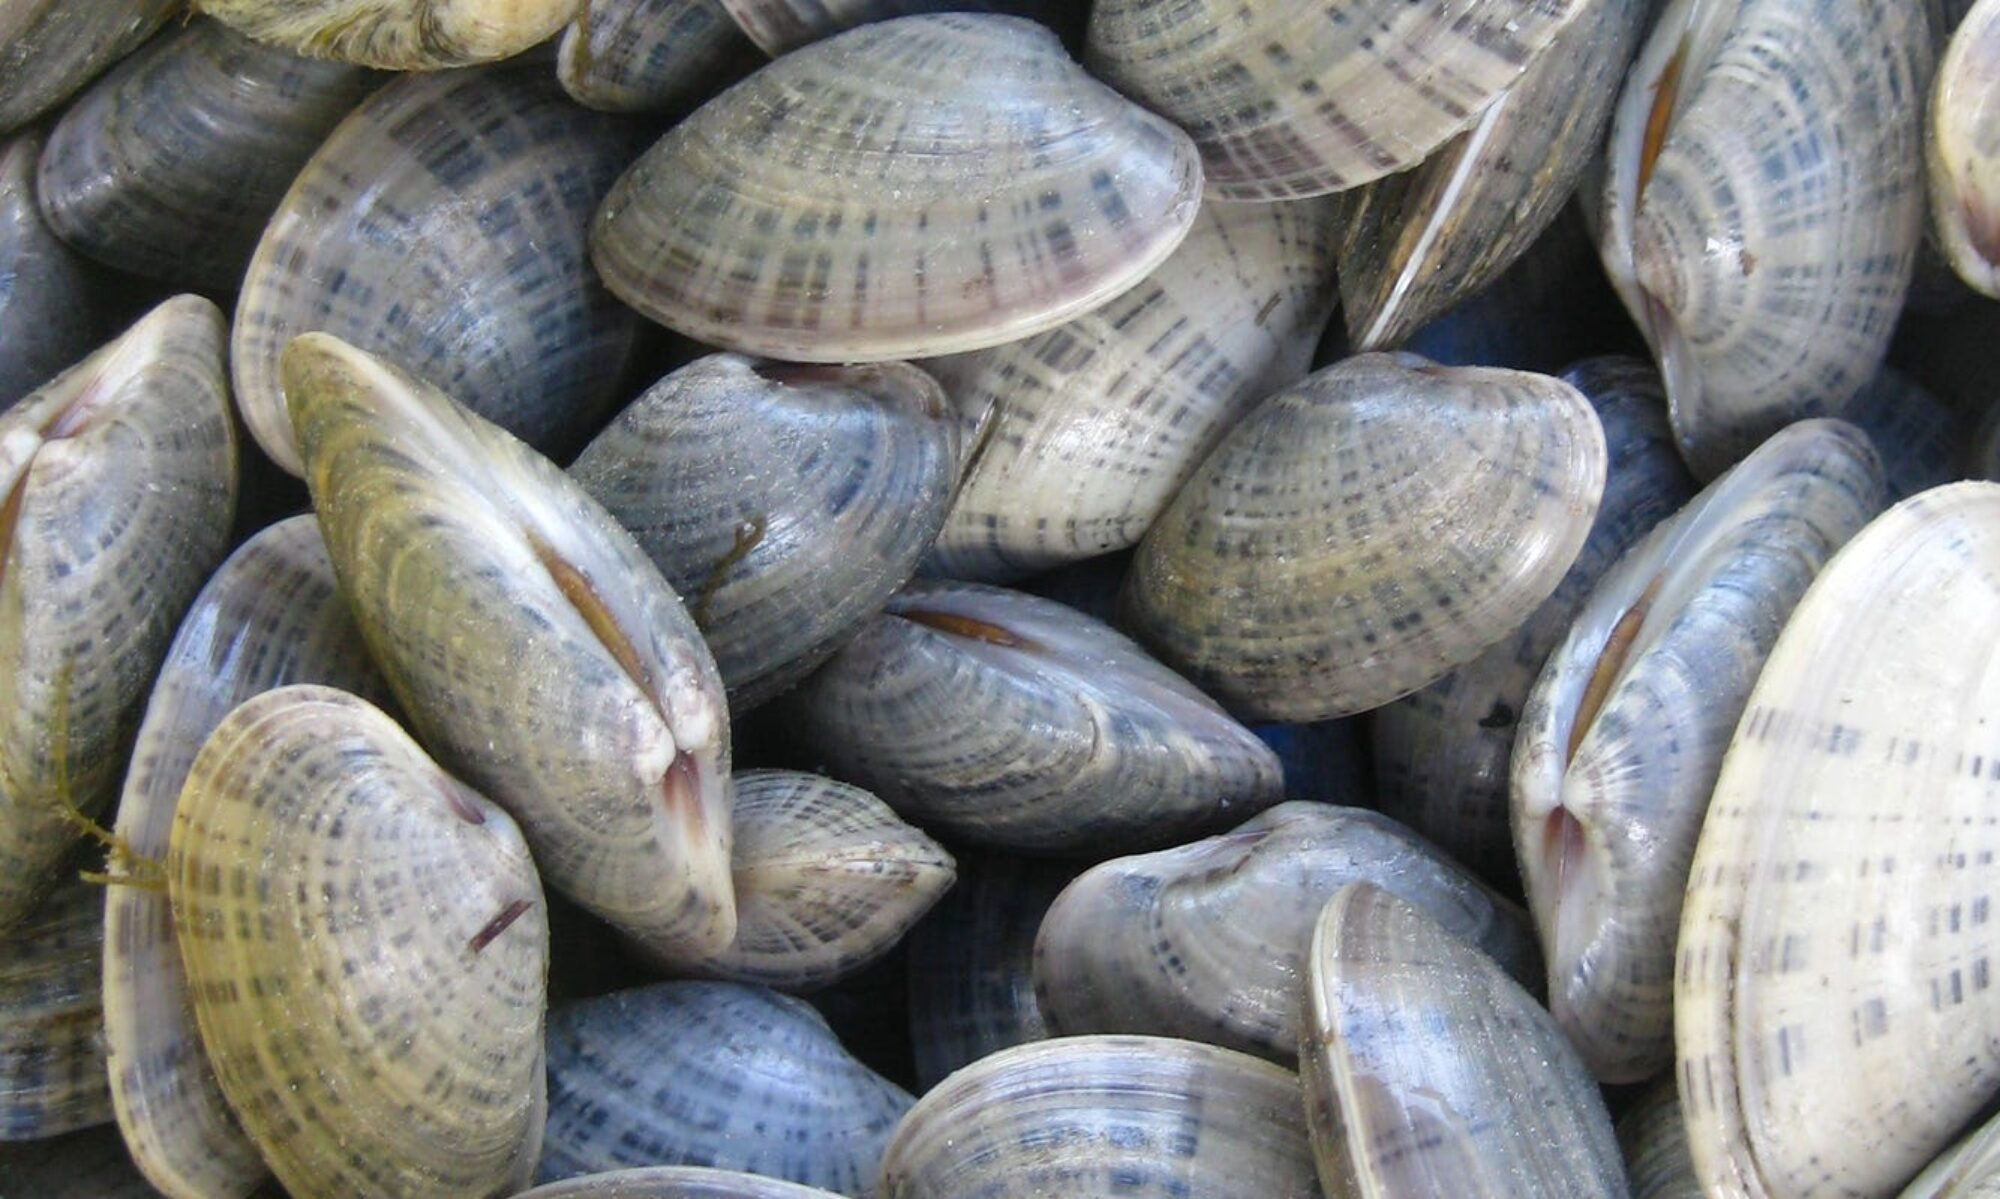 Shellfish Pathology Laboratory